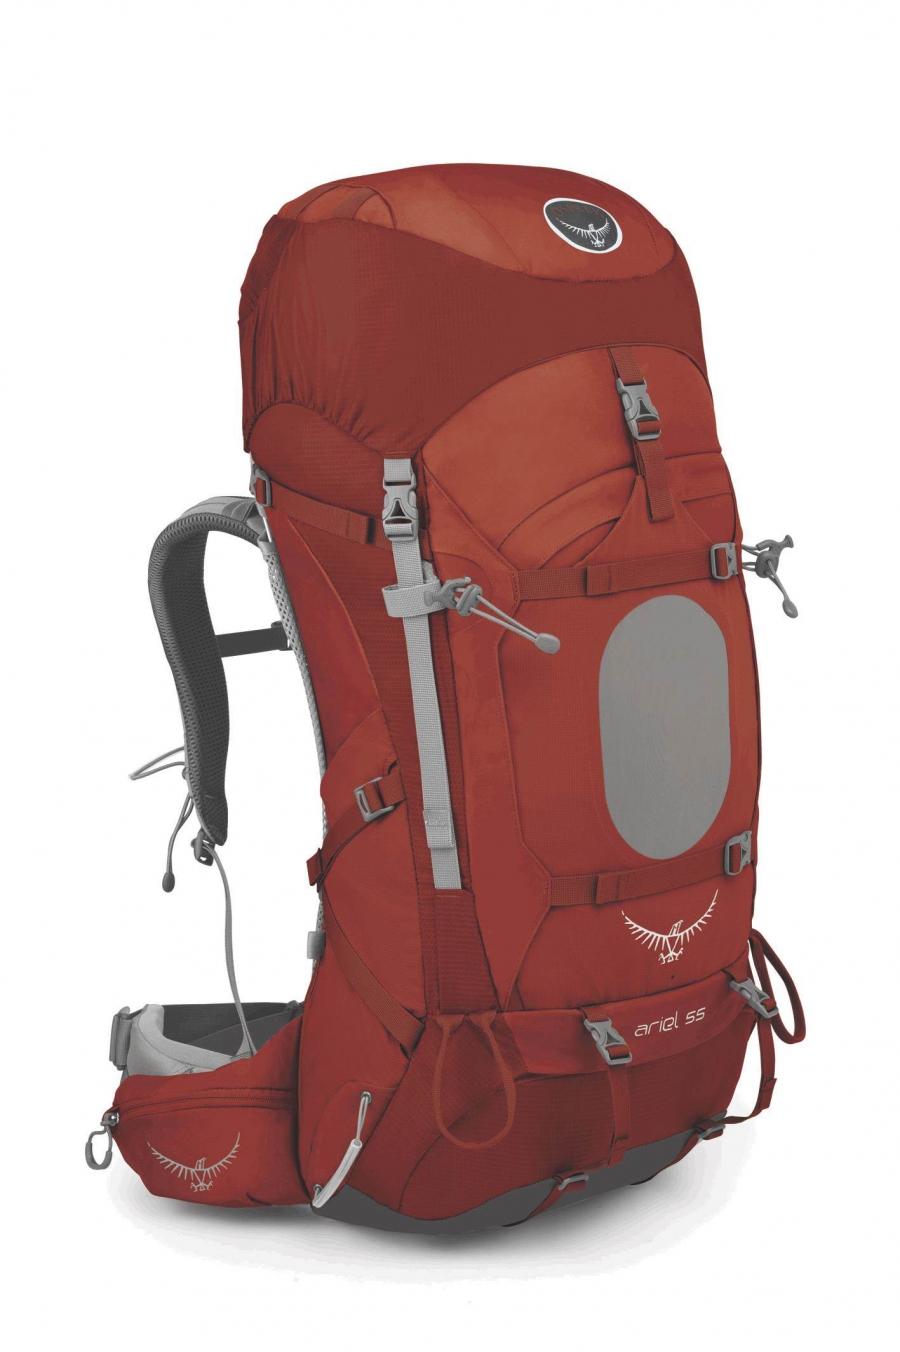 Kit review: Osprey Ariel Women's Rucksack Reviewed